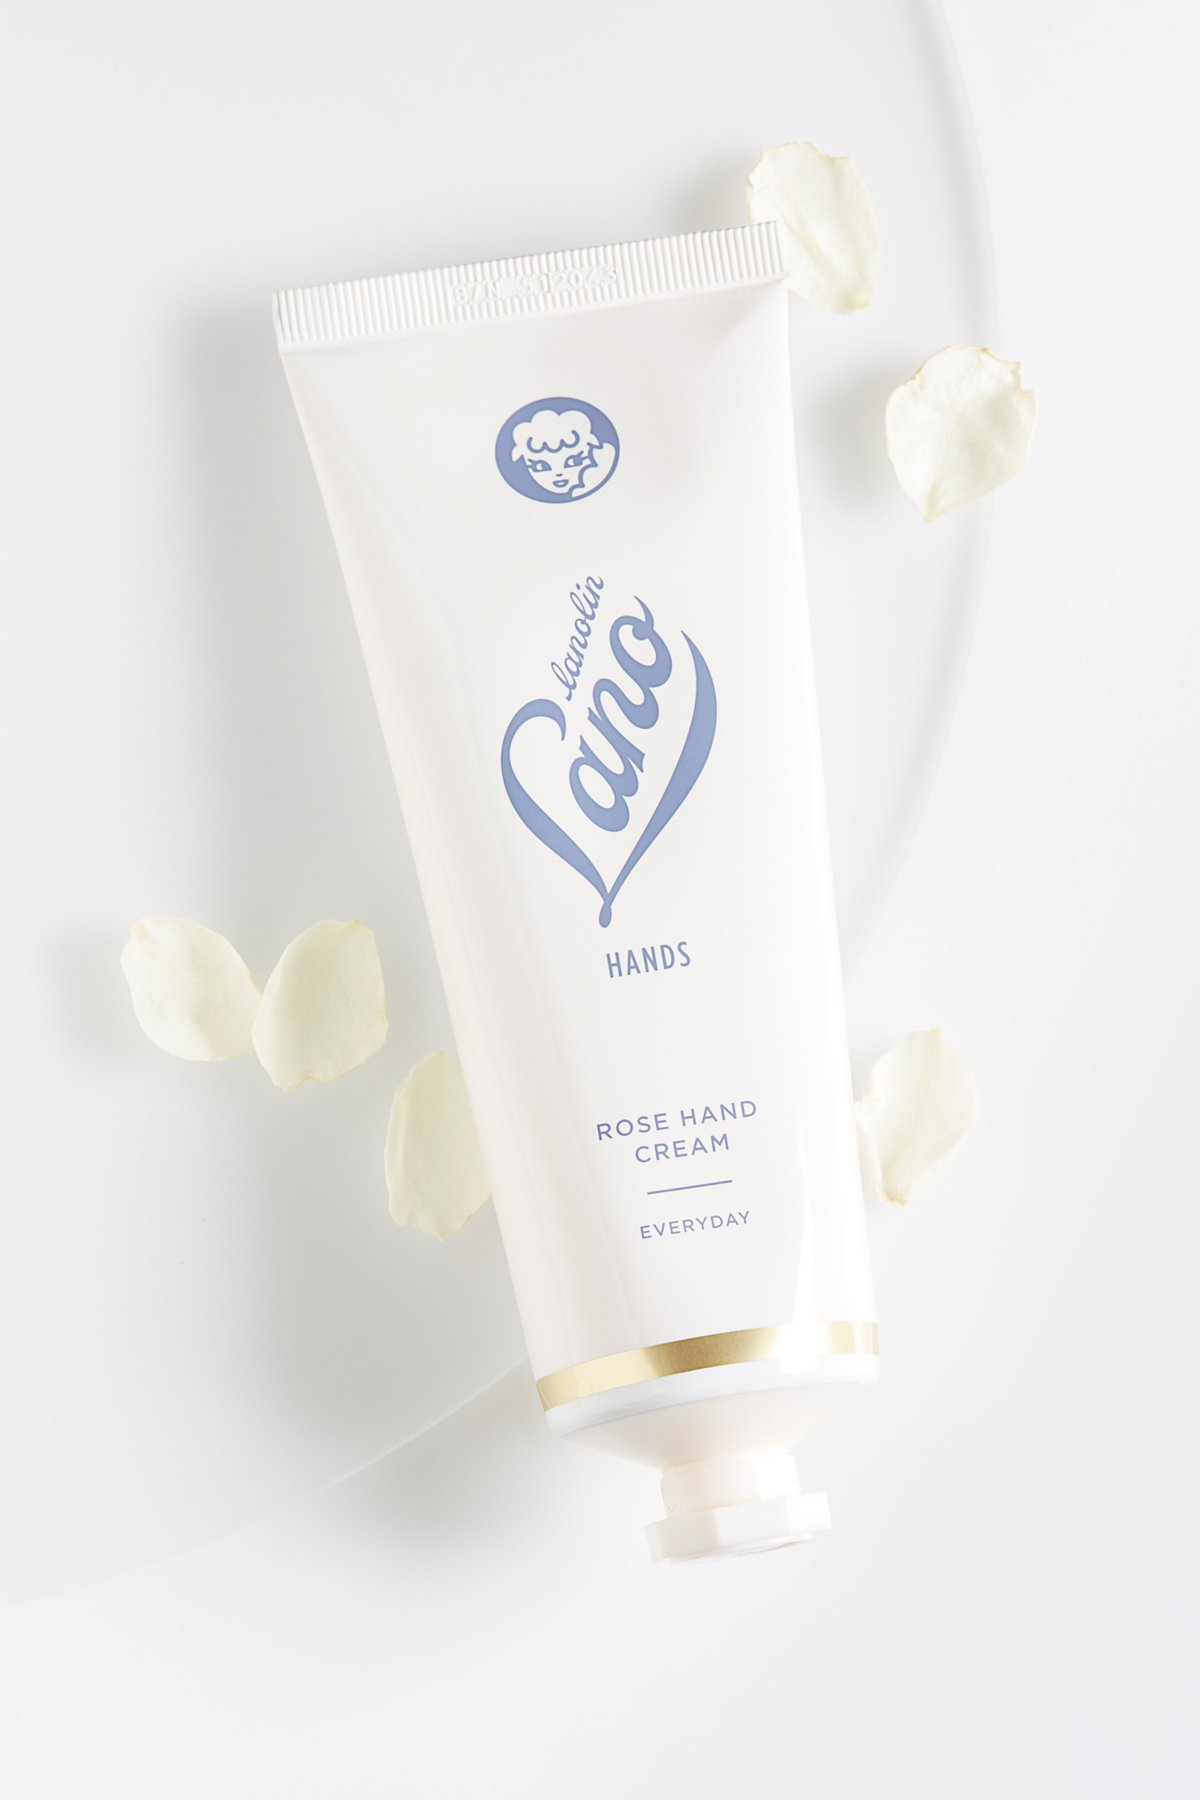 Rose Hand Cream Everyday